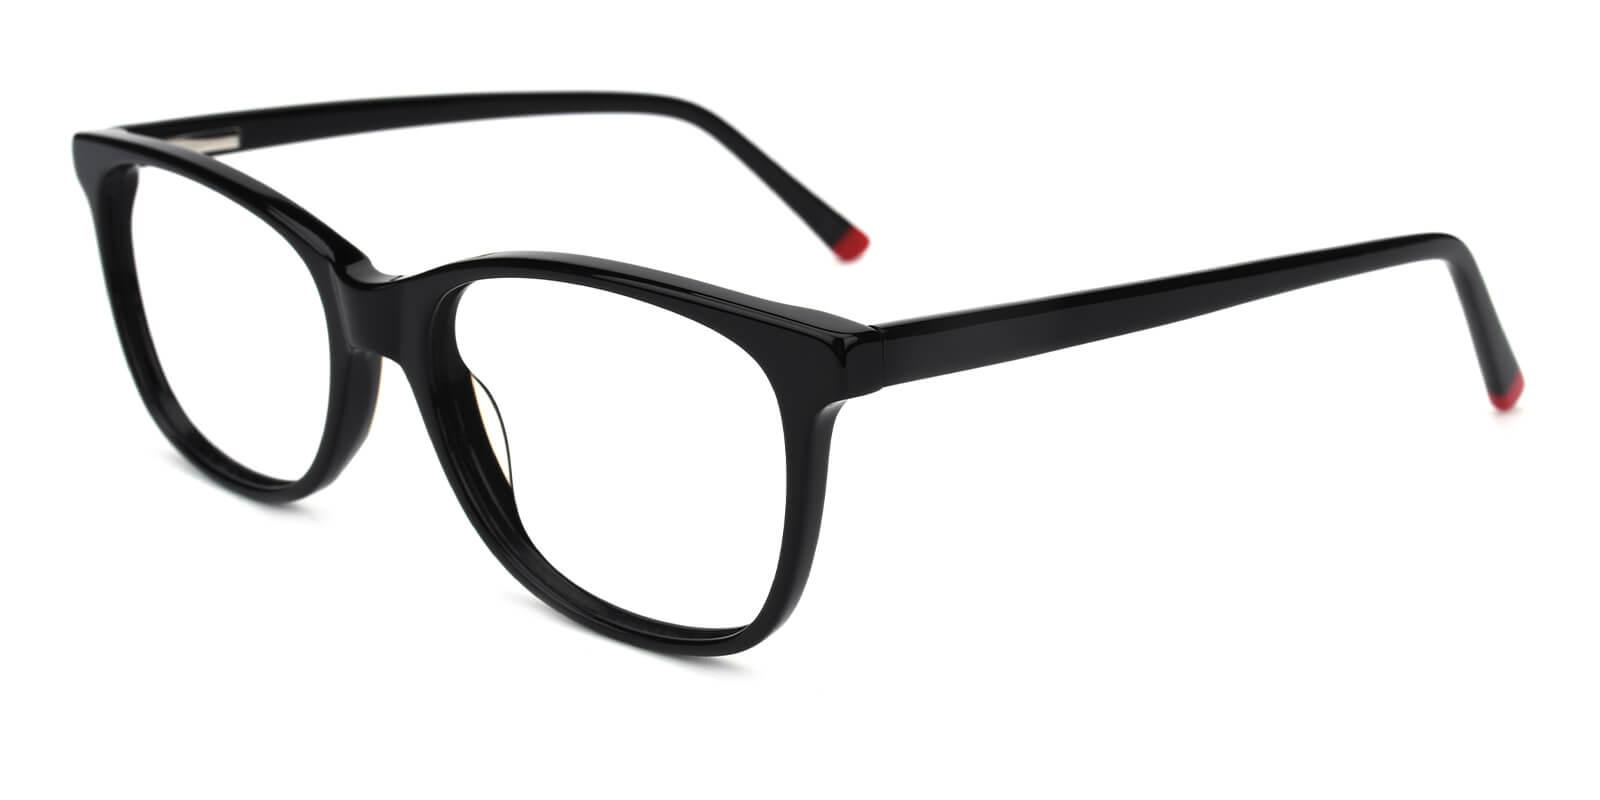 Sandwich-Black-Square-Acetate-Eyeglasses-detail